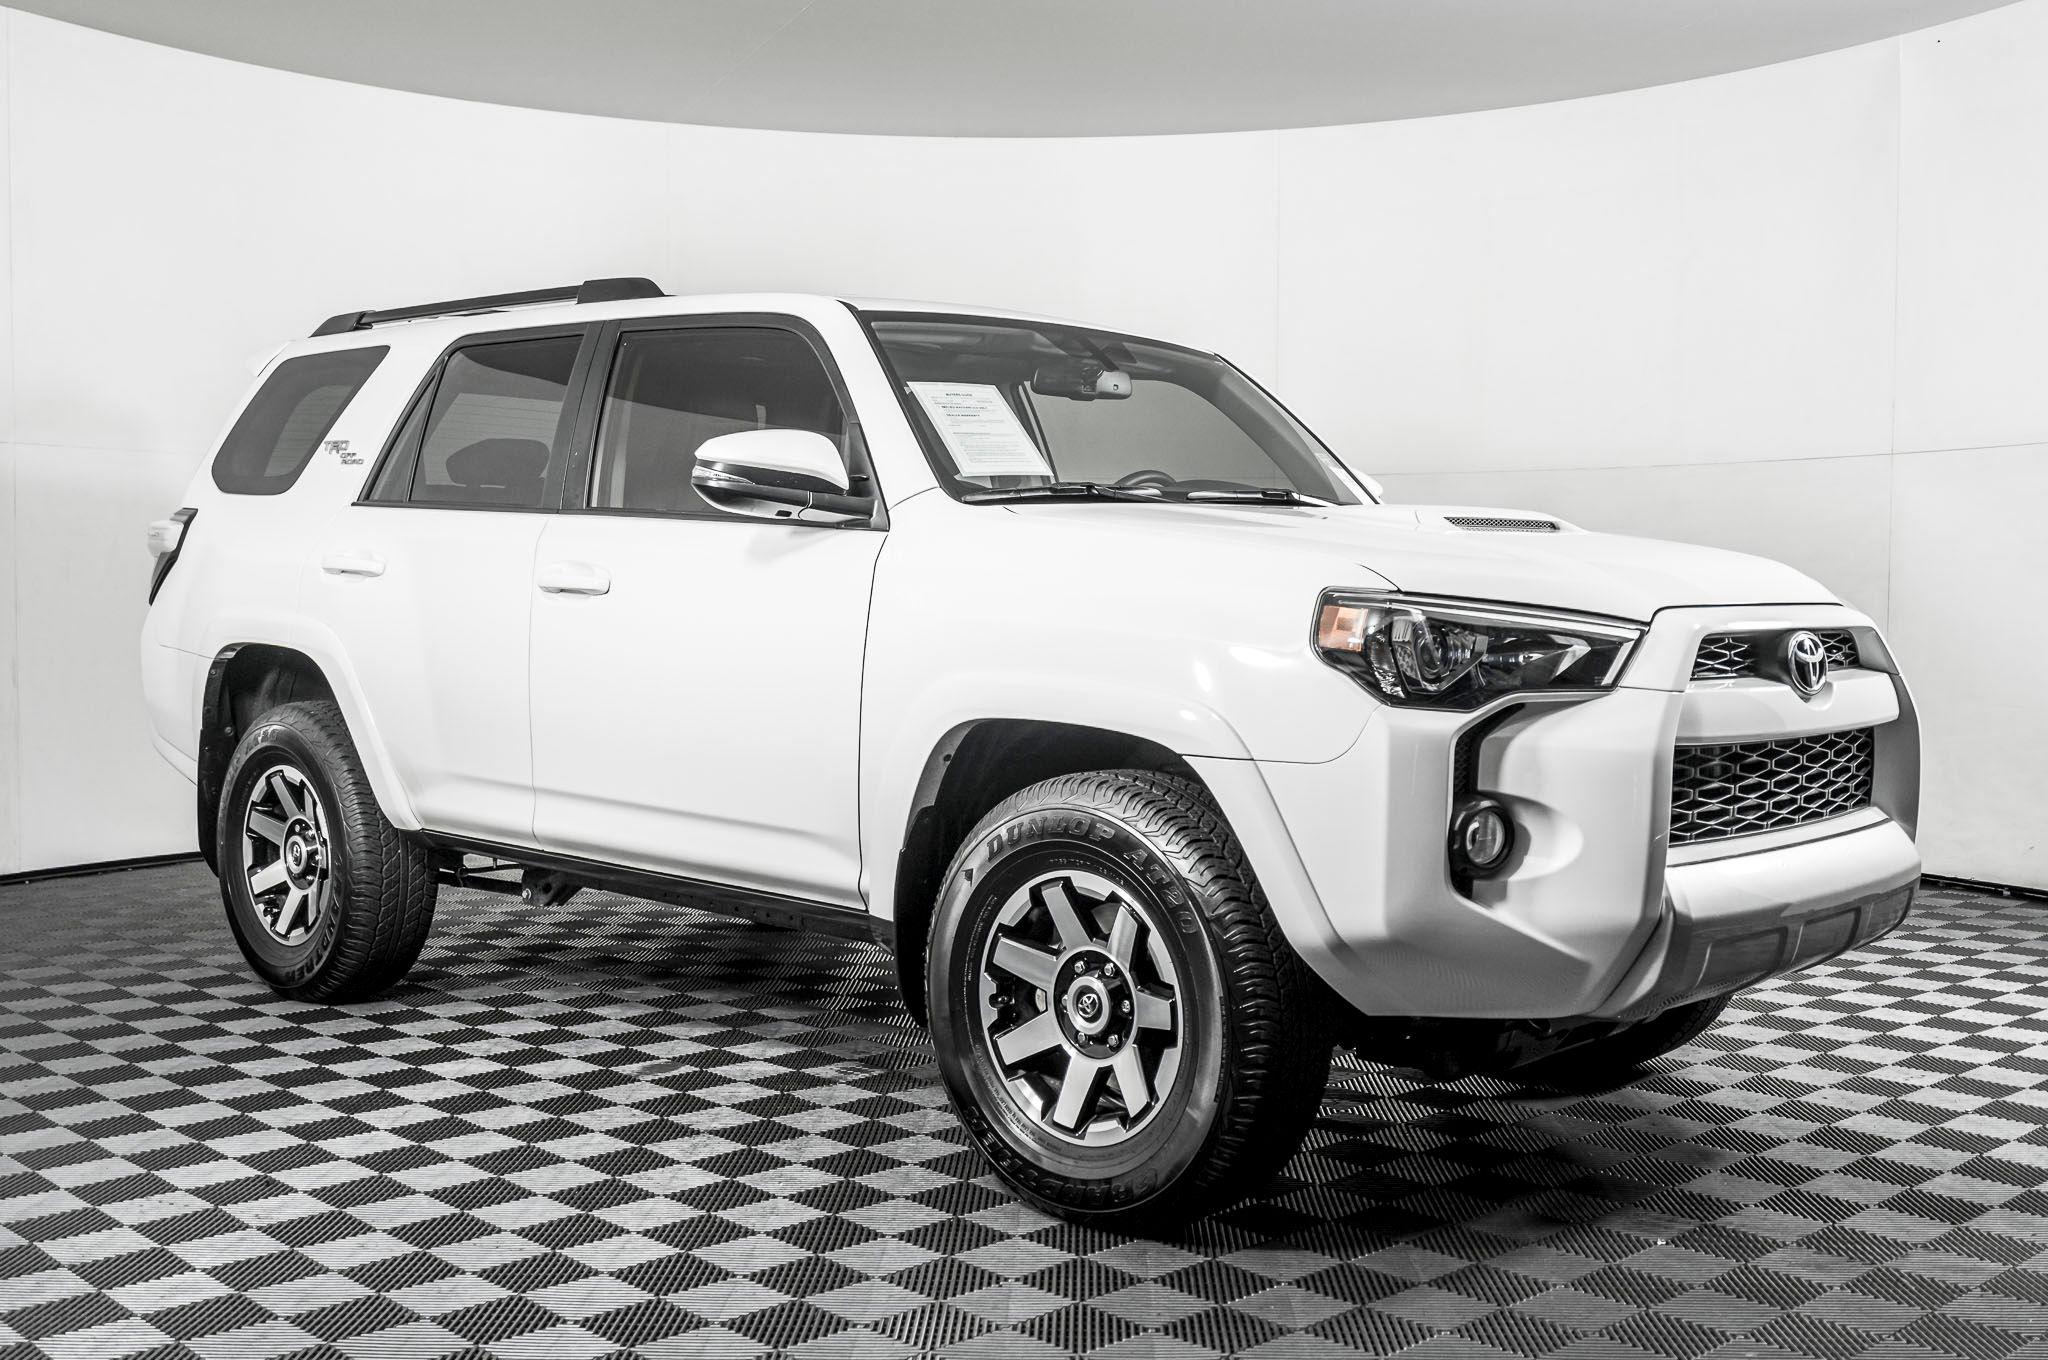 Used 2019 Toyota 4runner Trd Off Road 4x4 Suv For Sale Northwest Motorsport